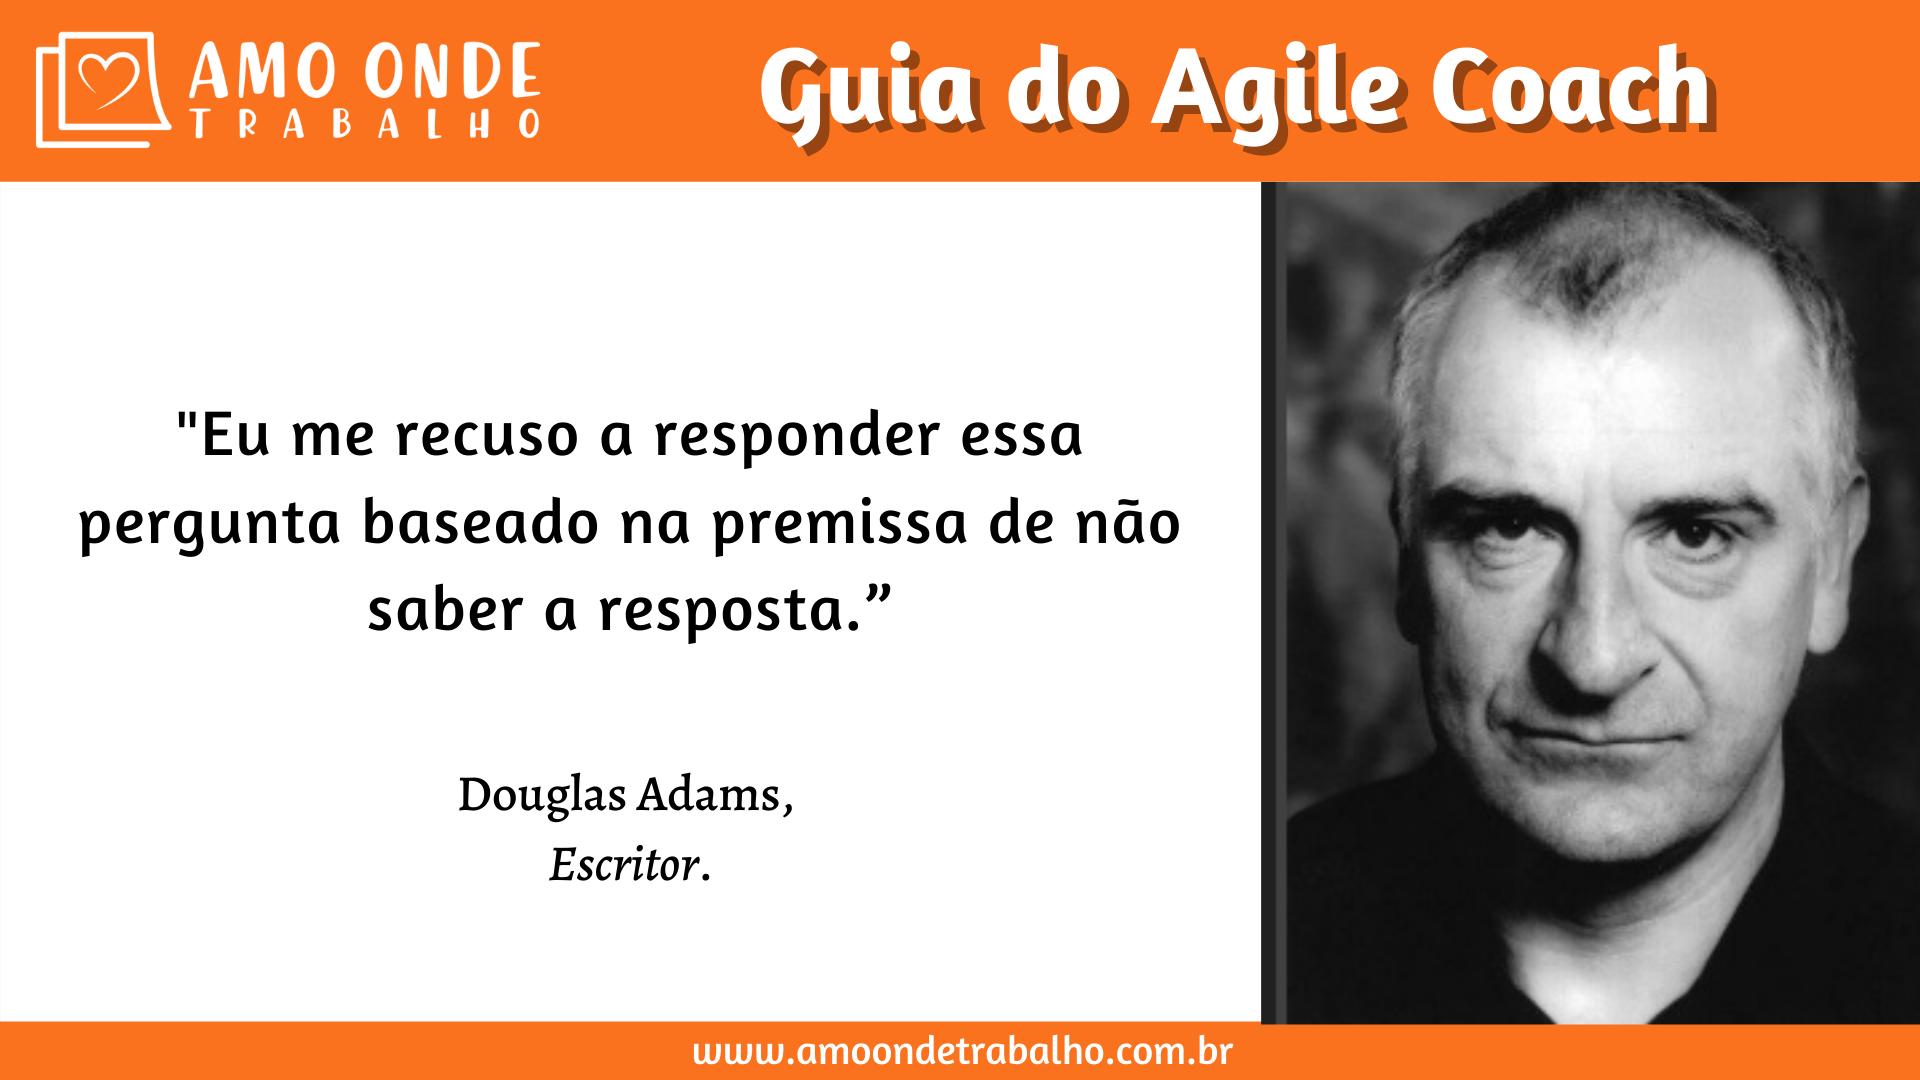 Agile Coach - Citação Douglas Adams